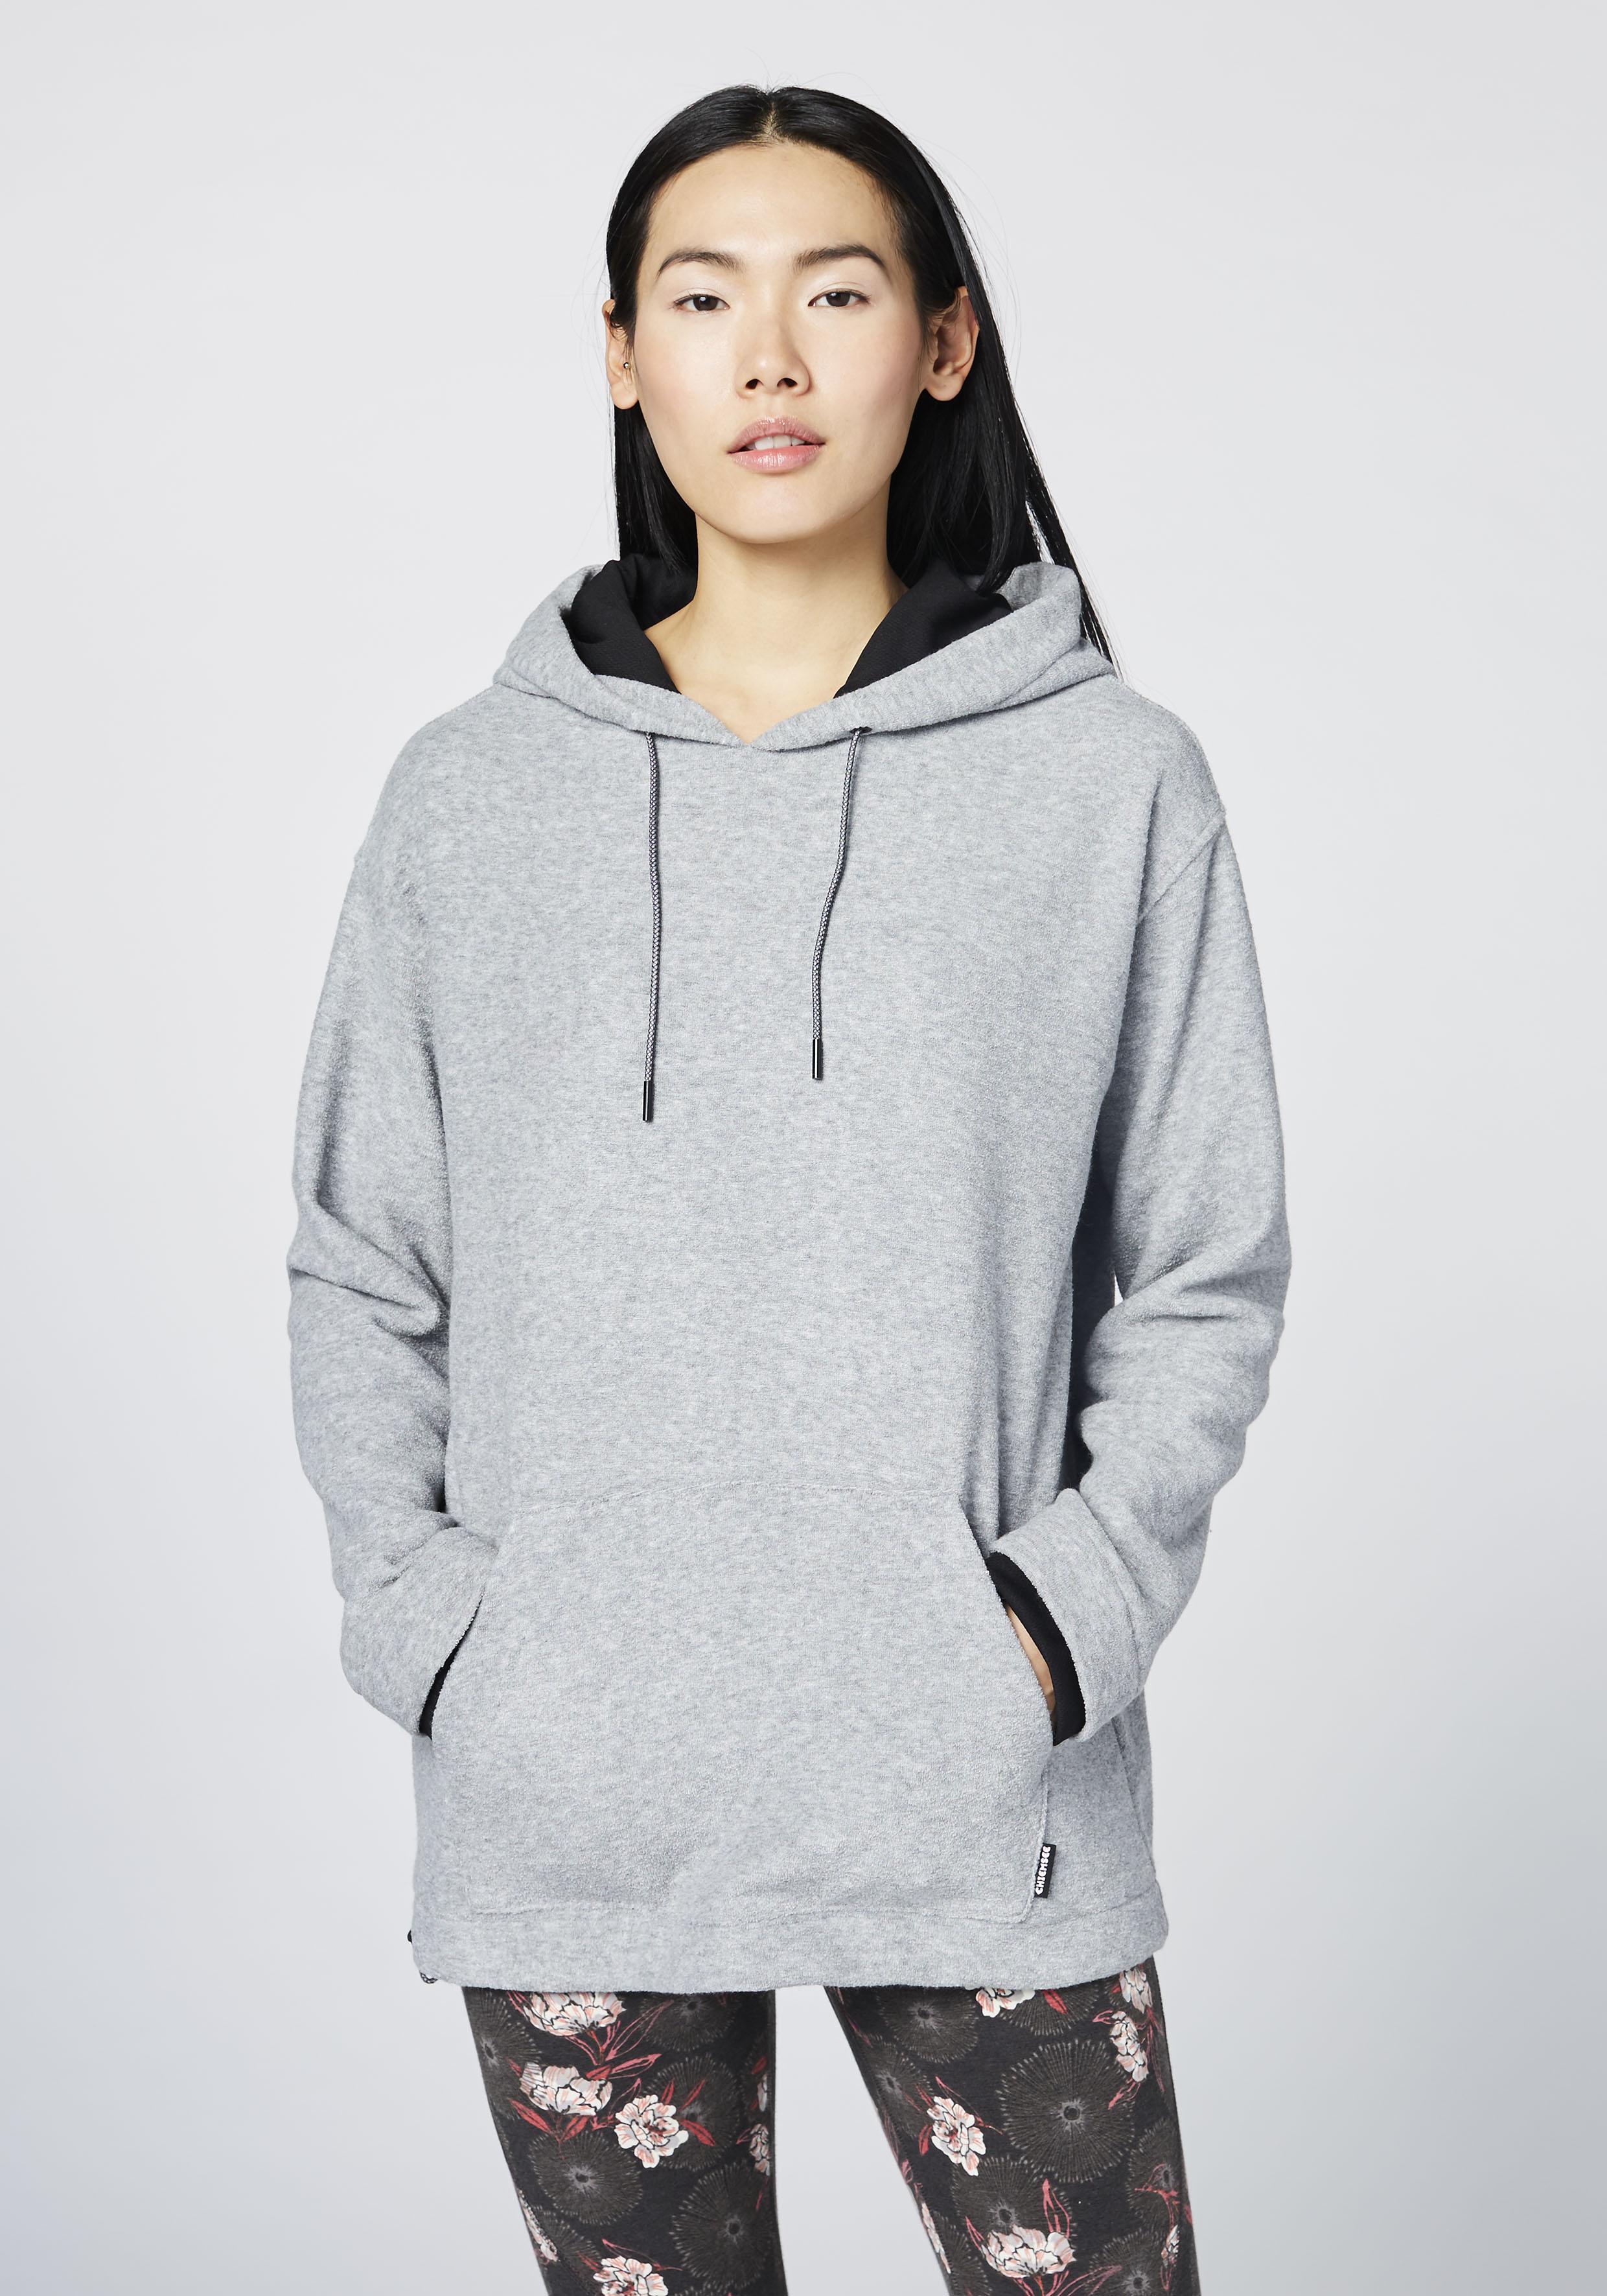 Chiemsee Sweatshirt Fleece Sweatshirt für Damen